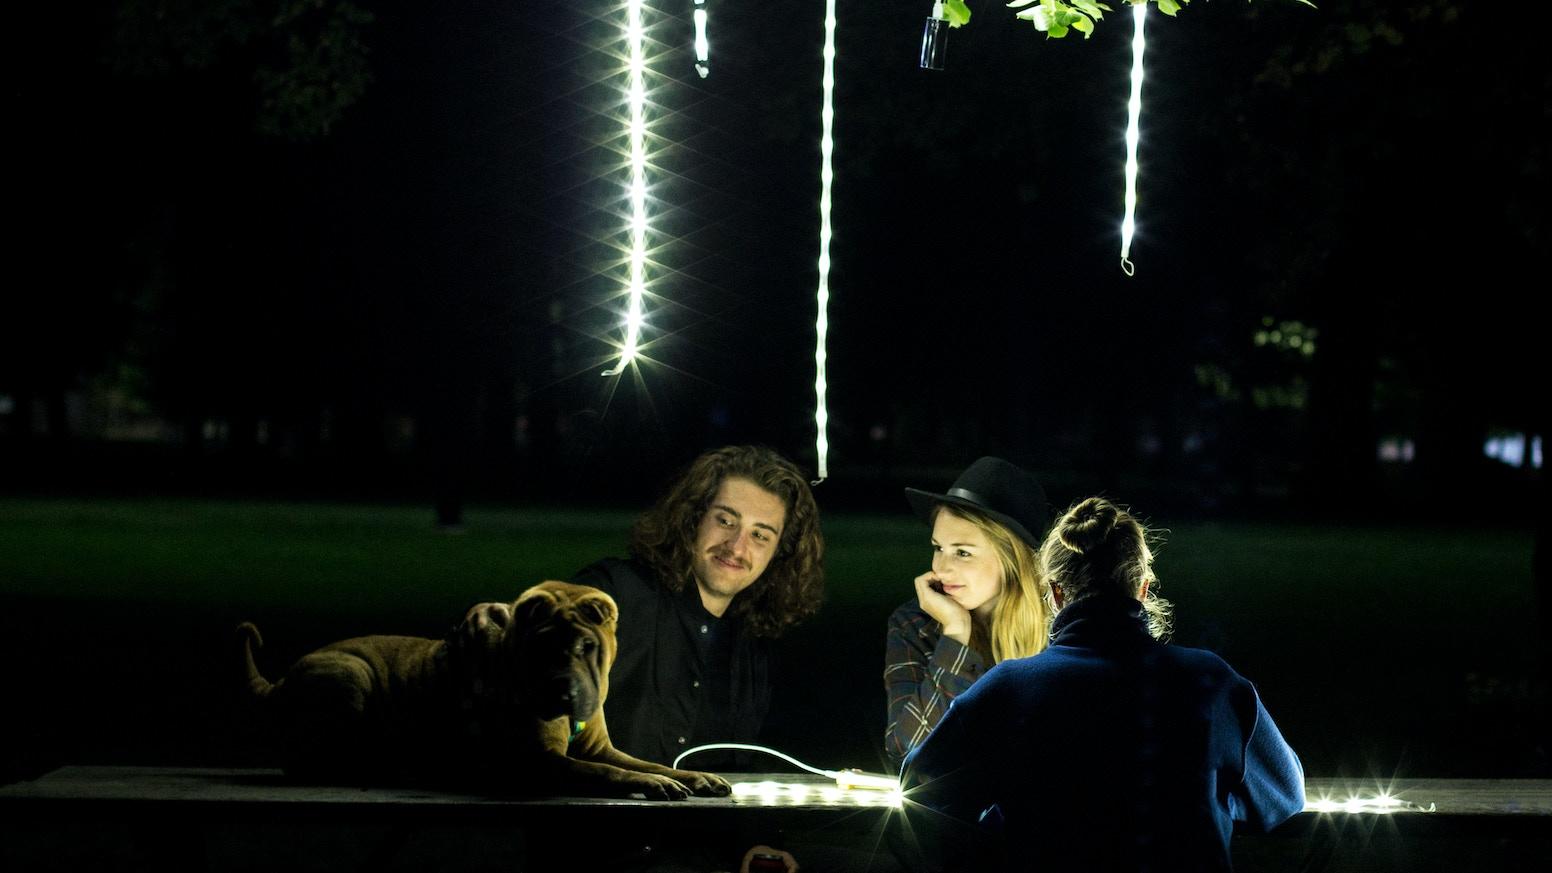 Use-everywhere portable LED light rope & lantern that sticks, ties, hooks, or hangs on virtually anything.